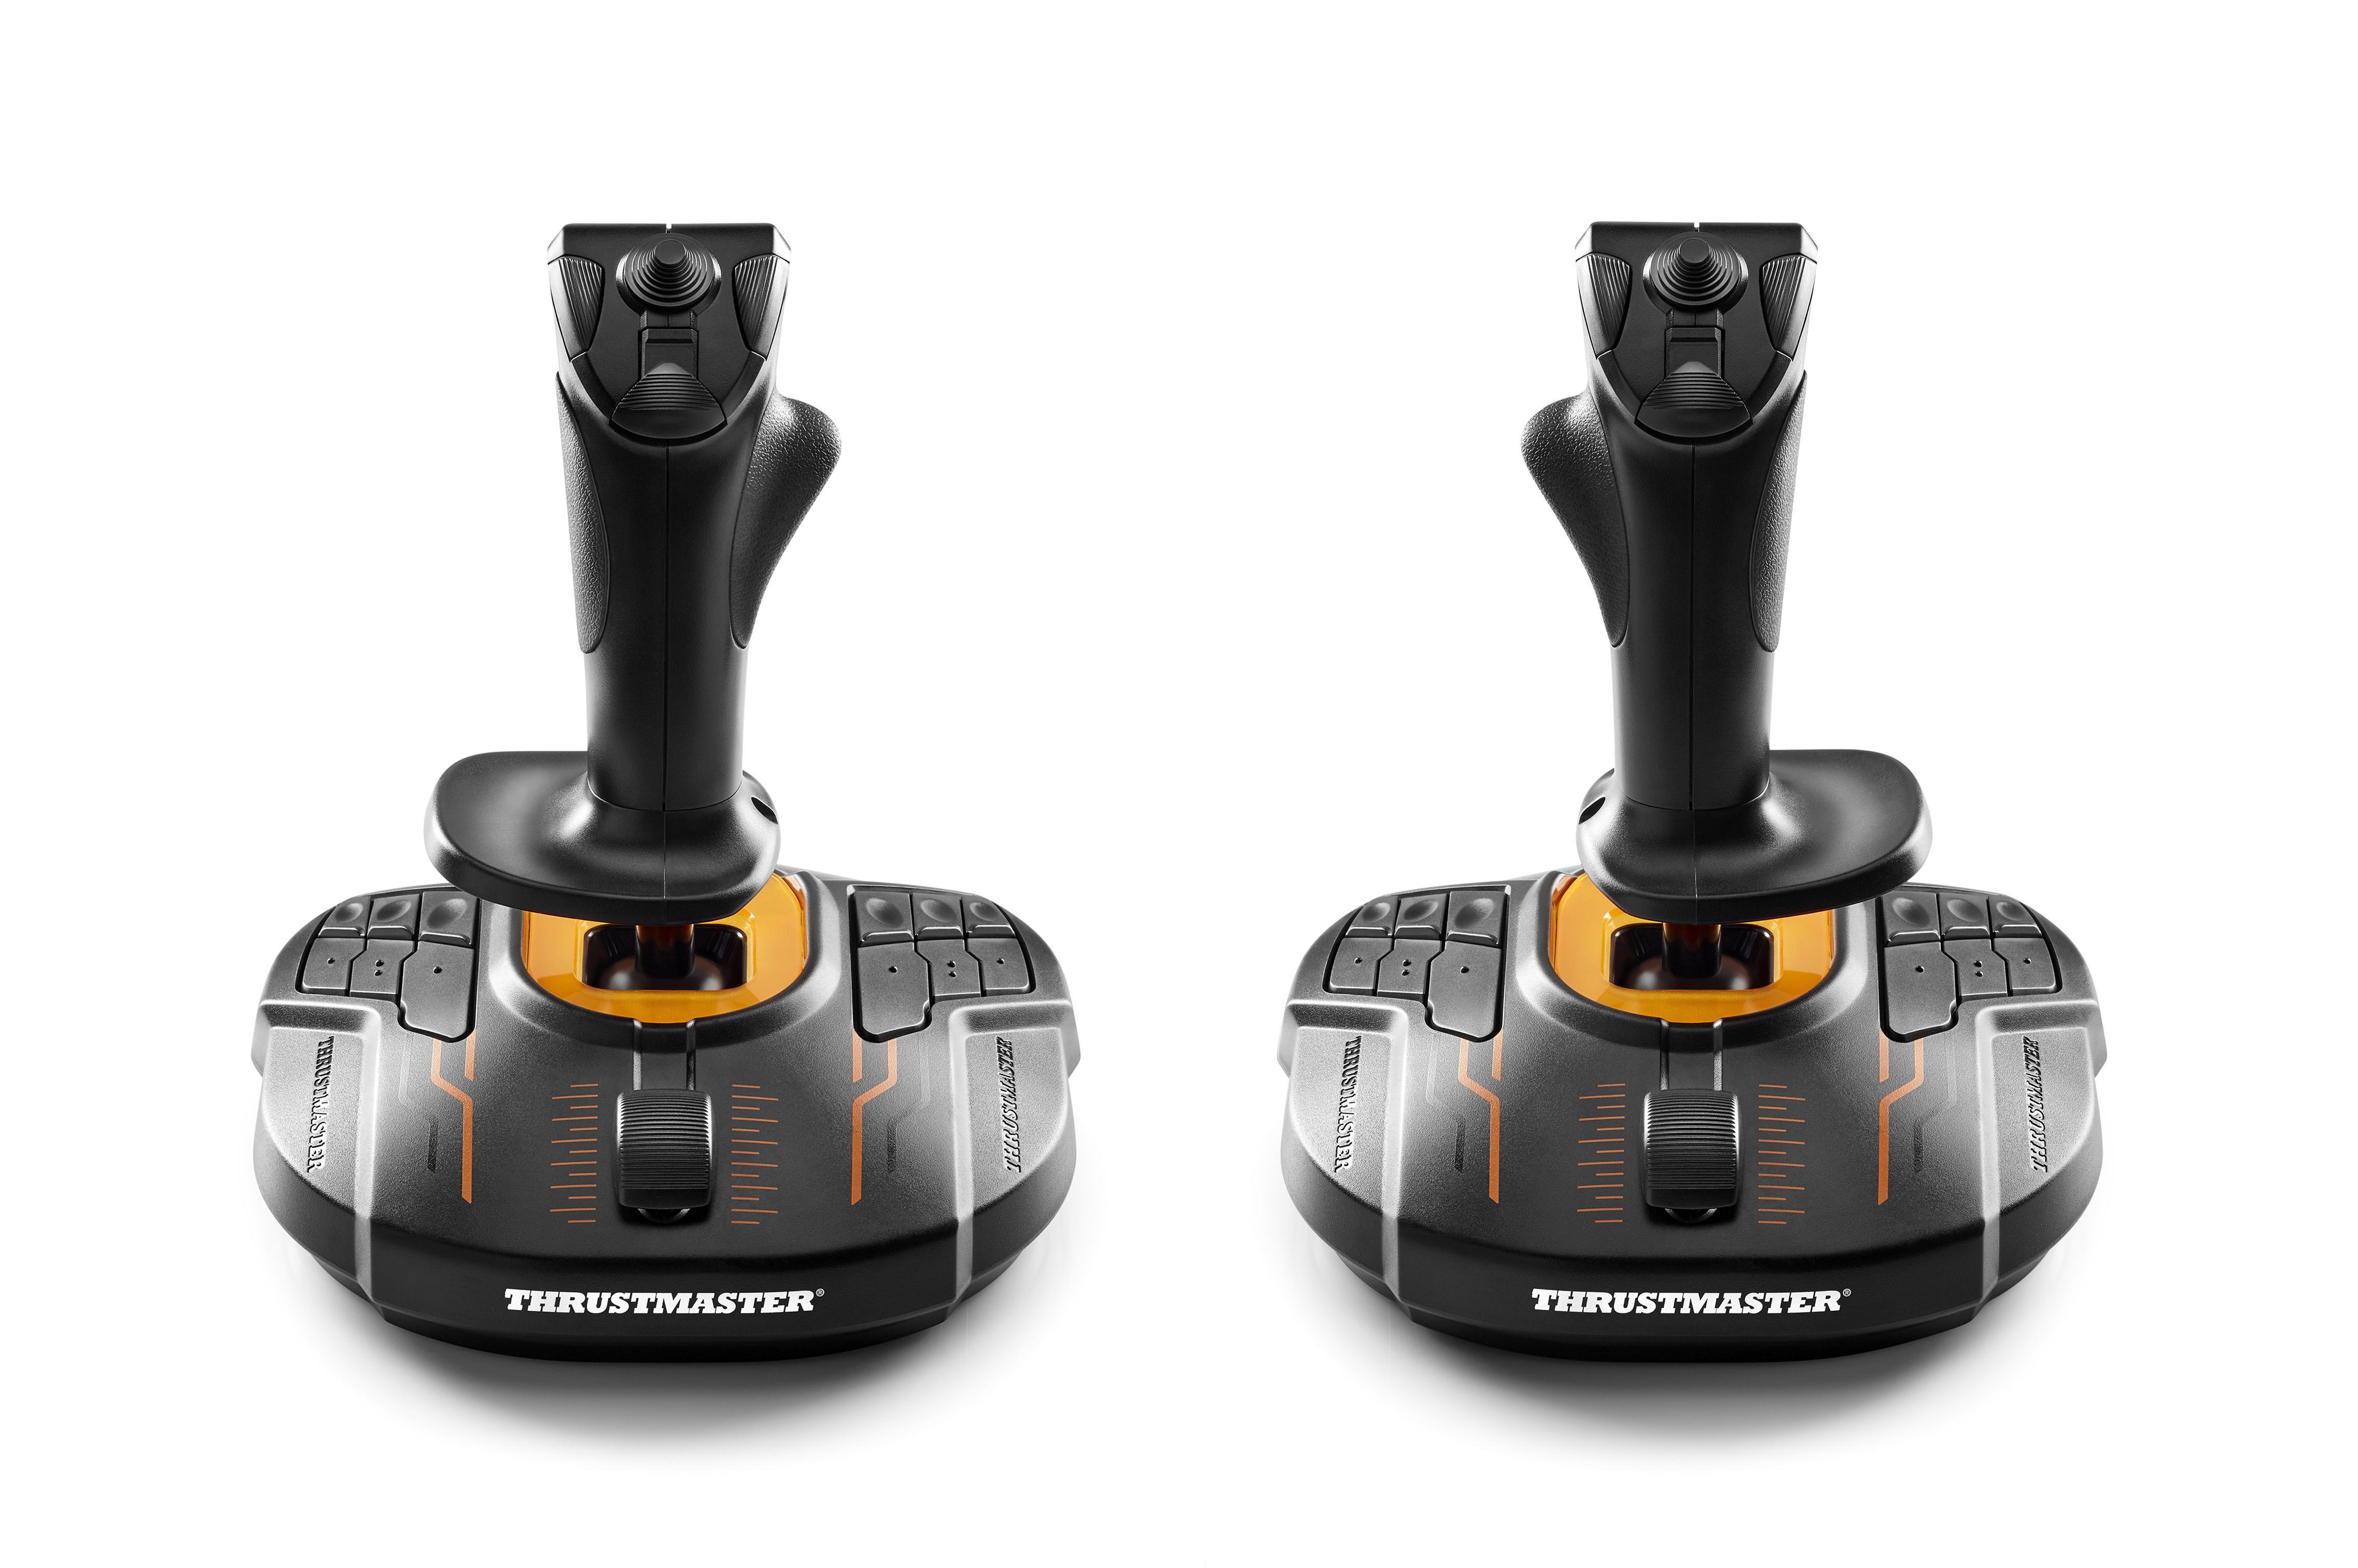 Amazon.com: Thrustmaster T 16000M SPACE SIM DUO STICK: Video Games